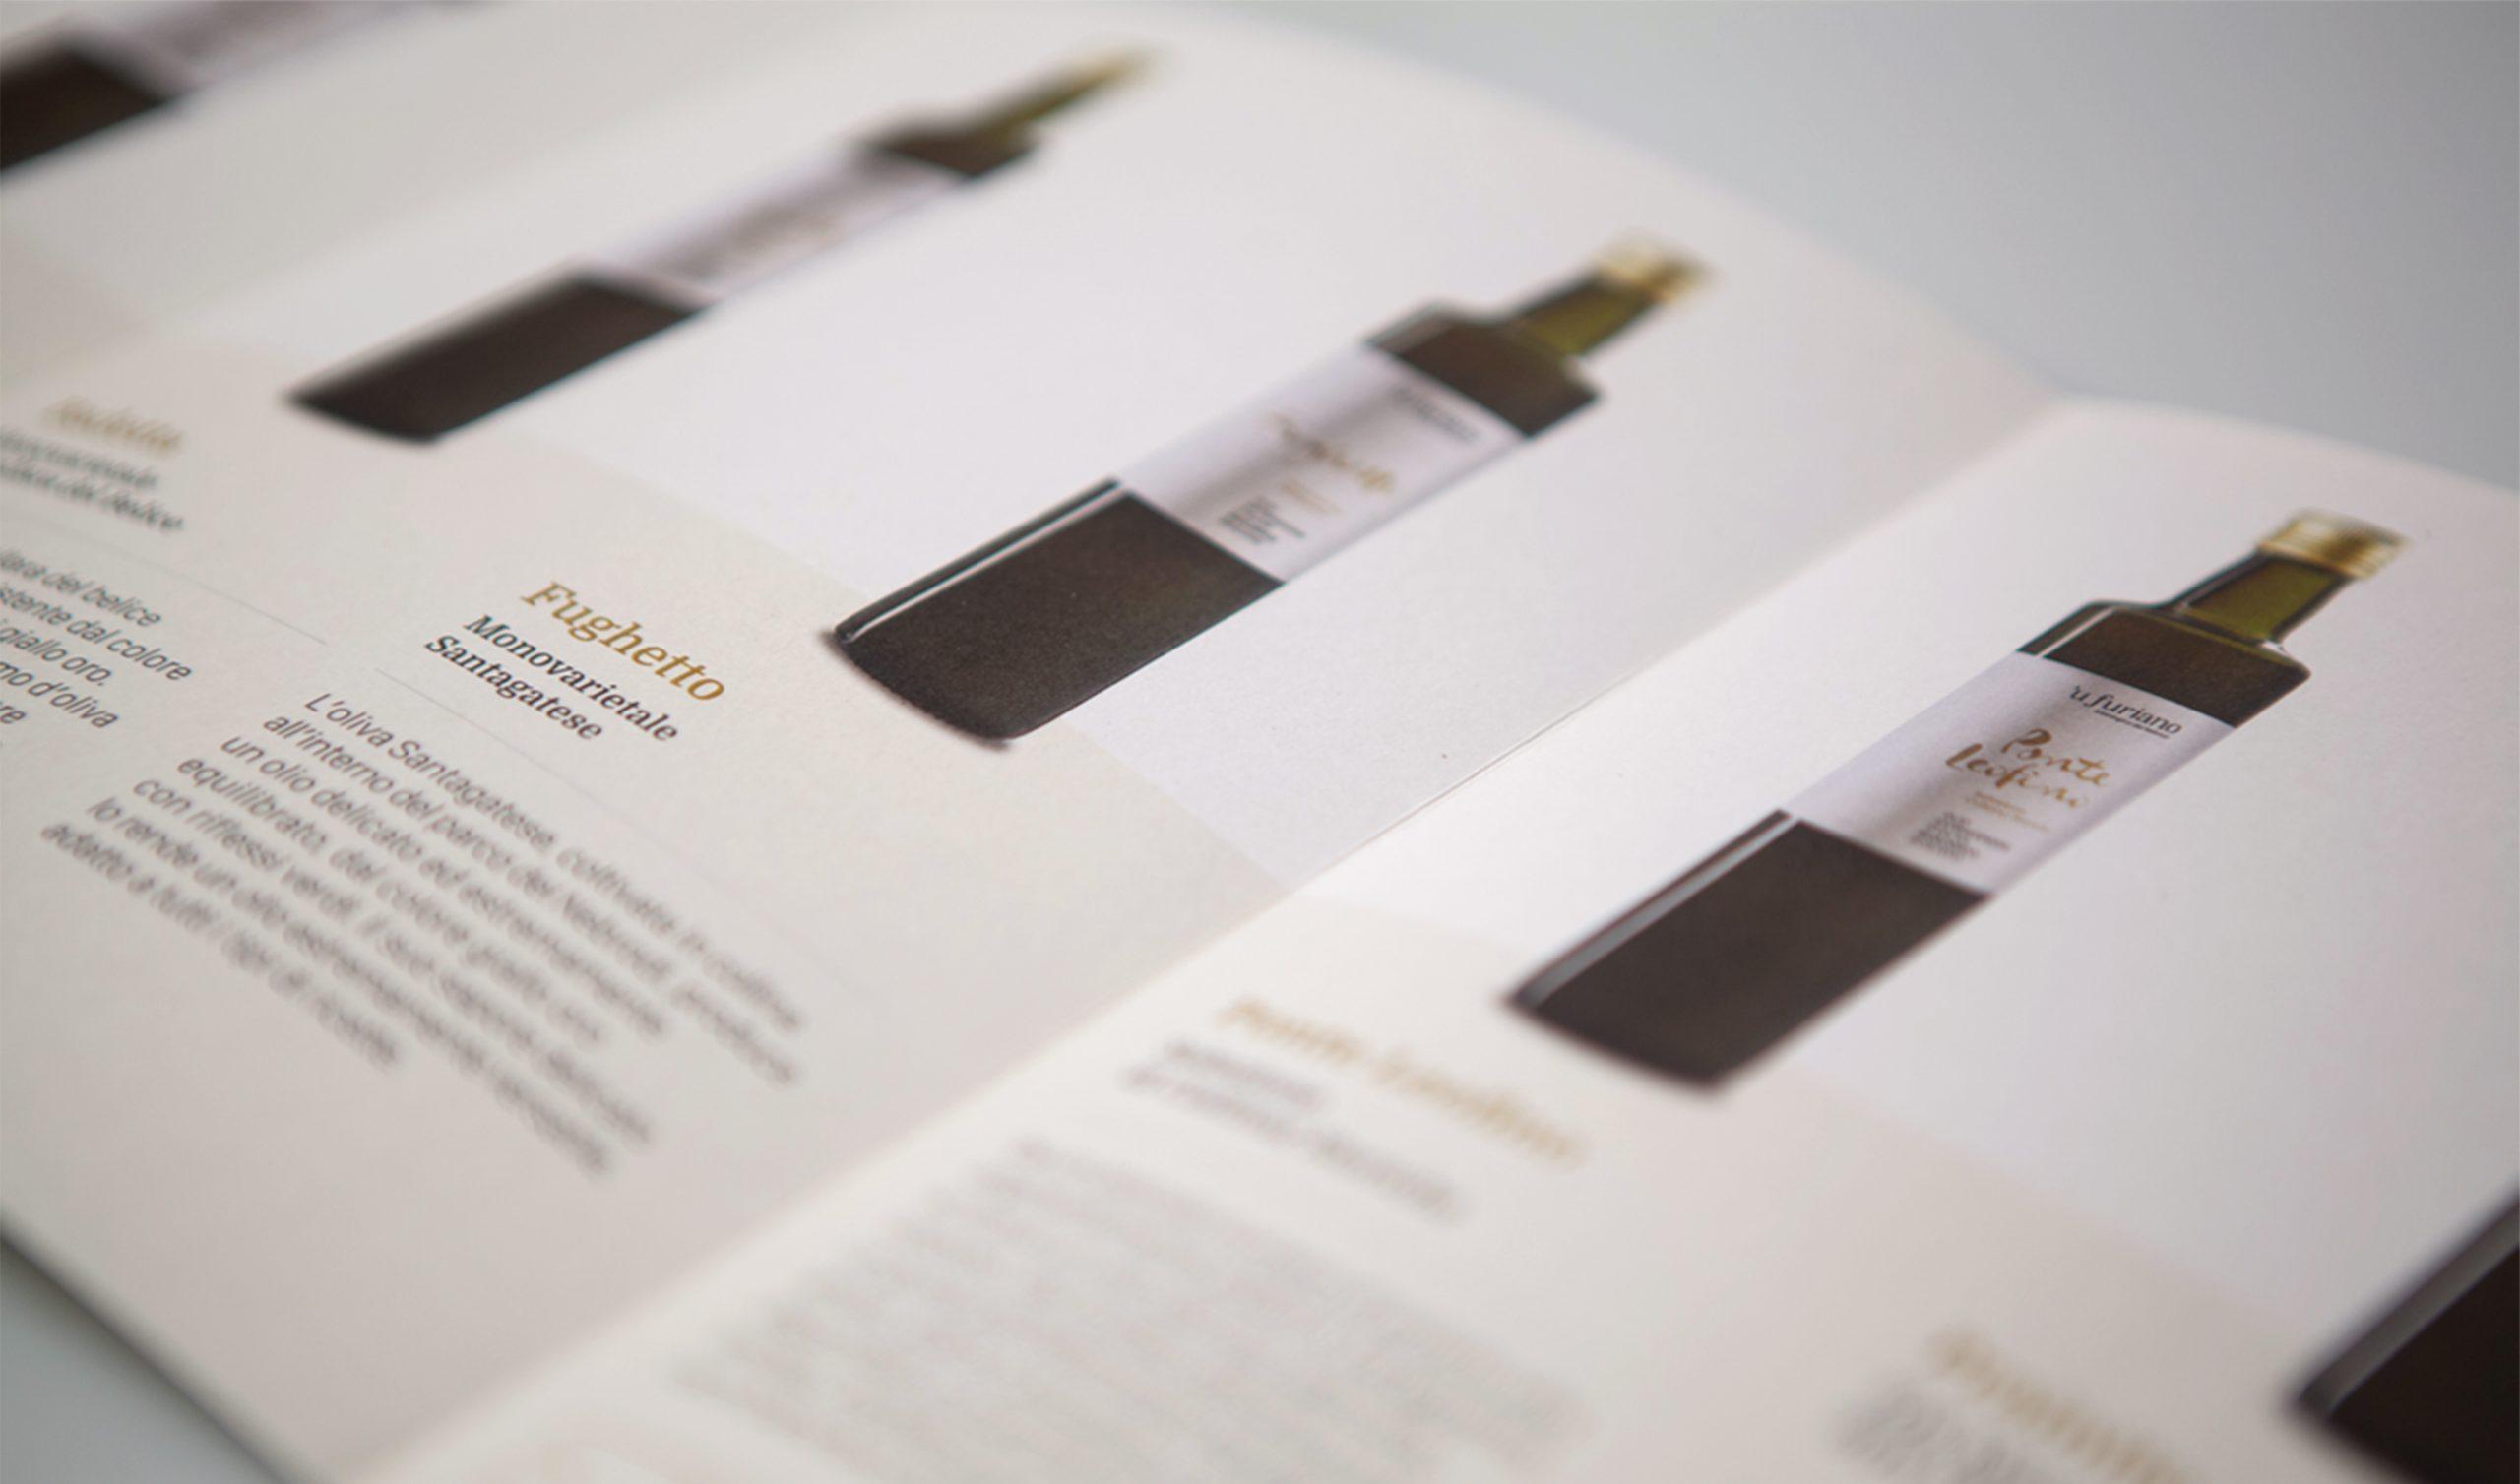 Olio 'u Furiano Packaging - Dettaglio Pieghevole